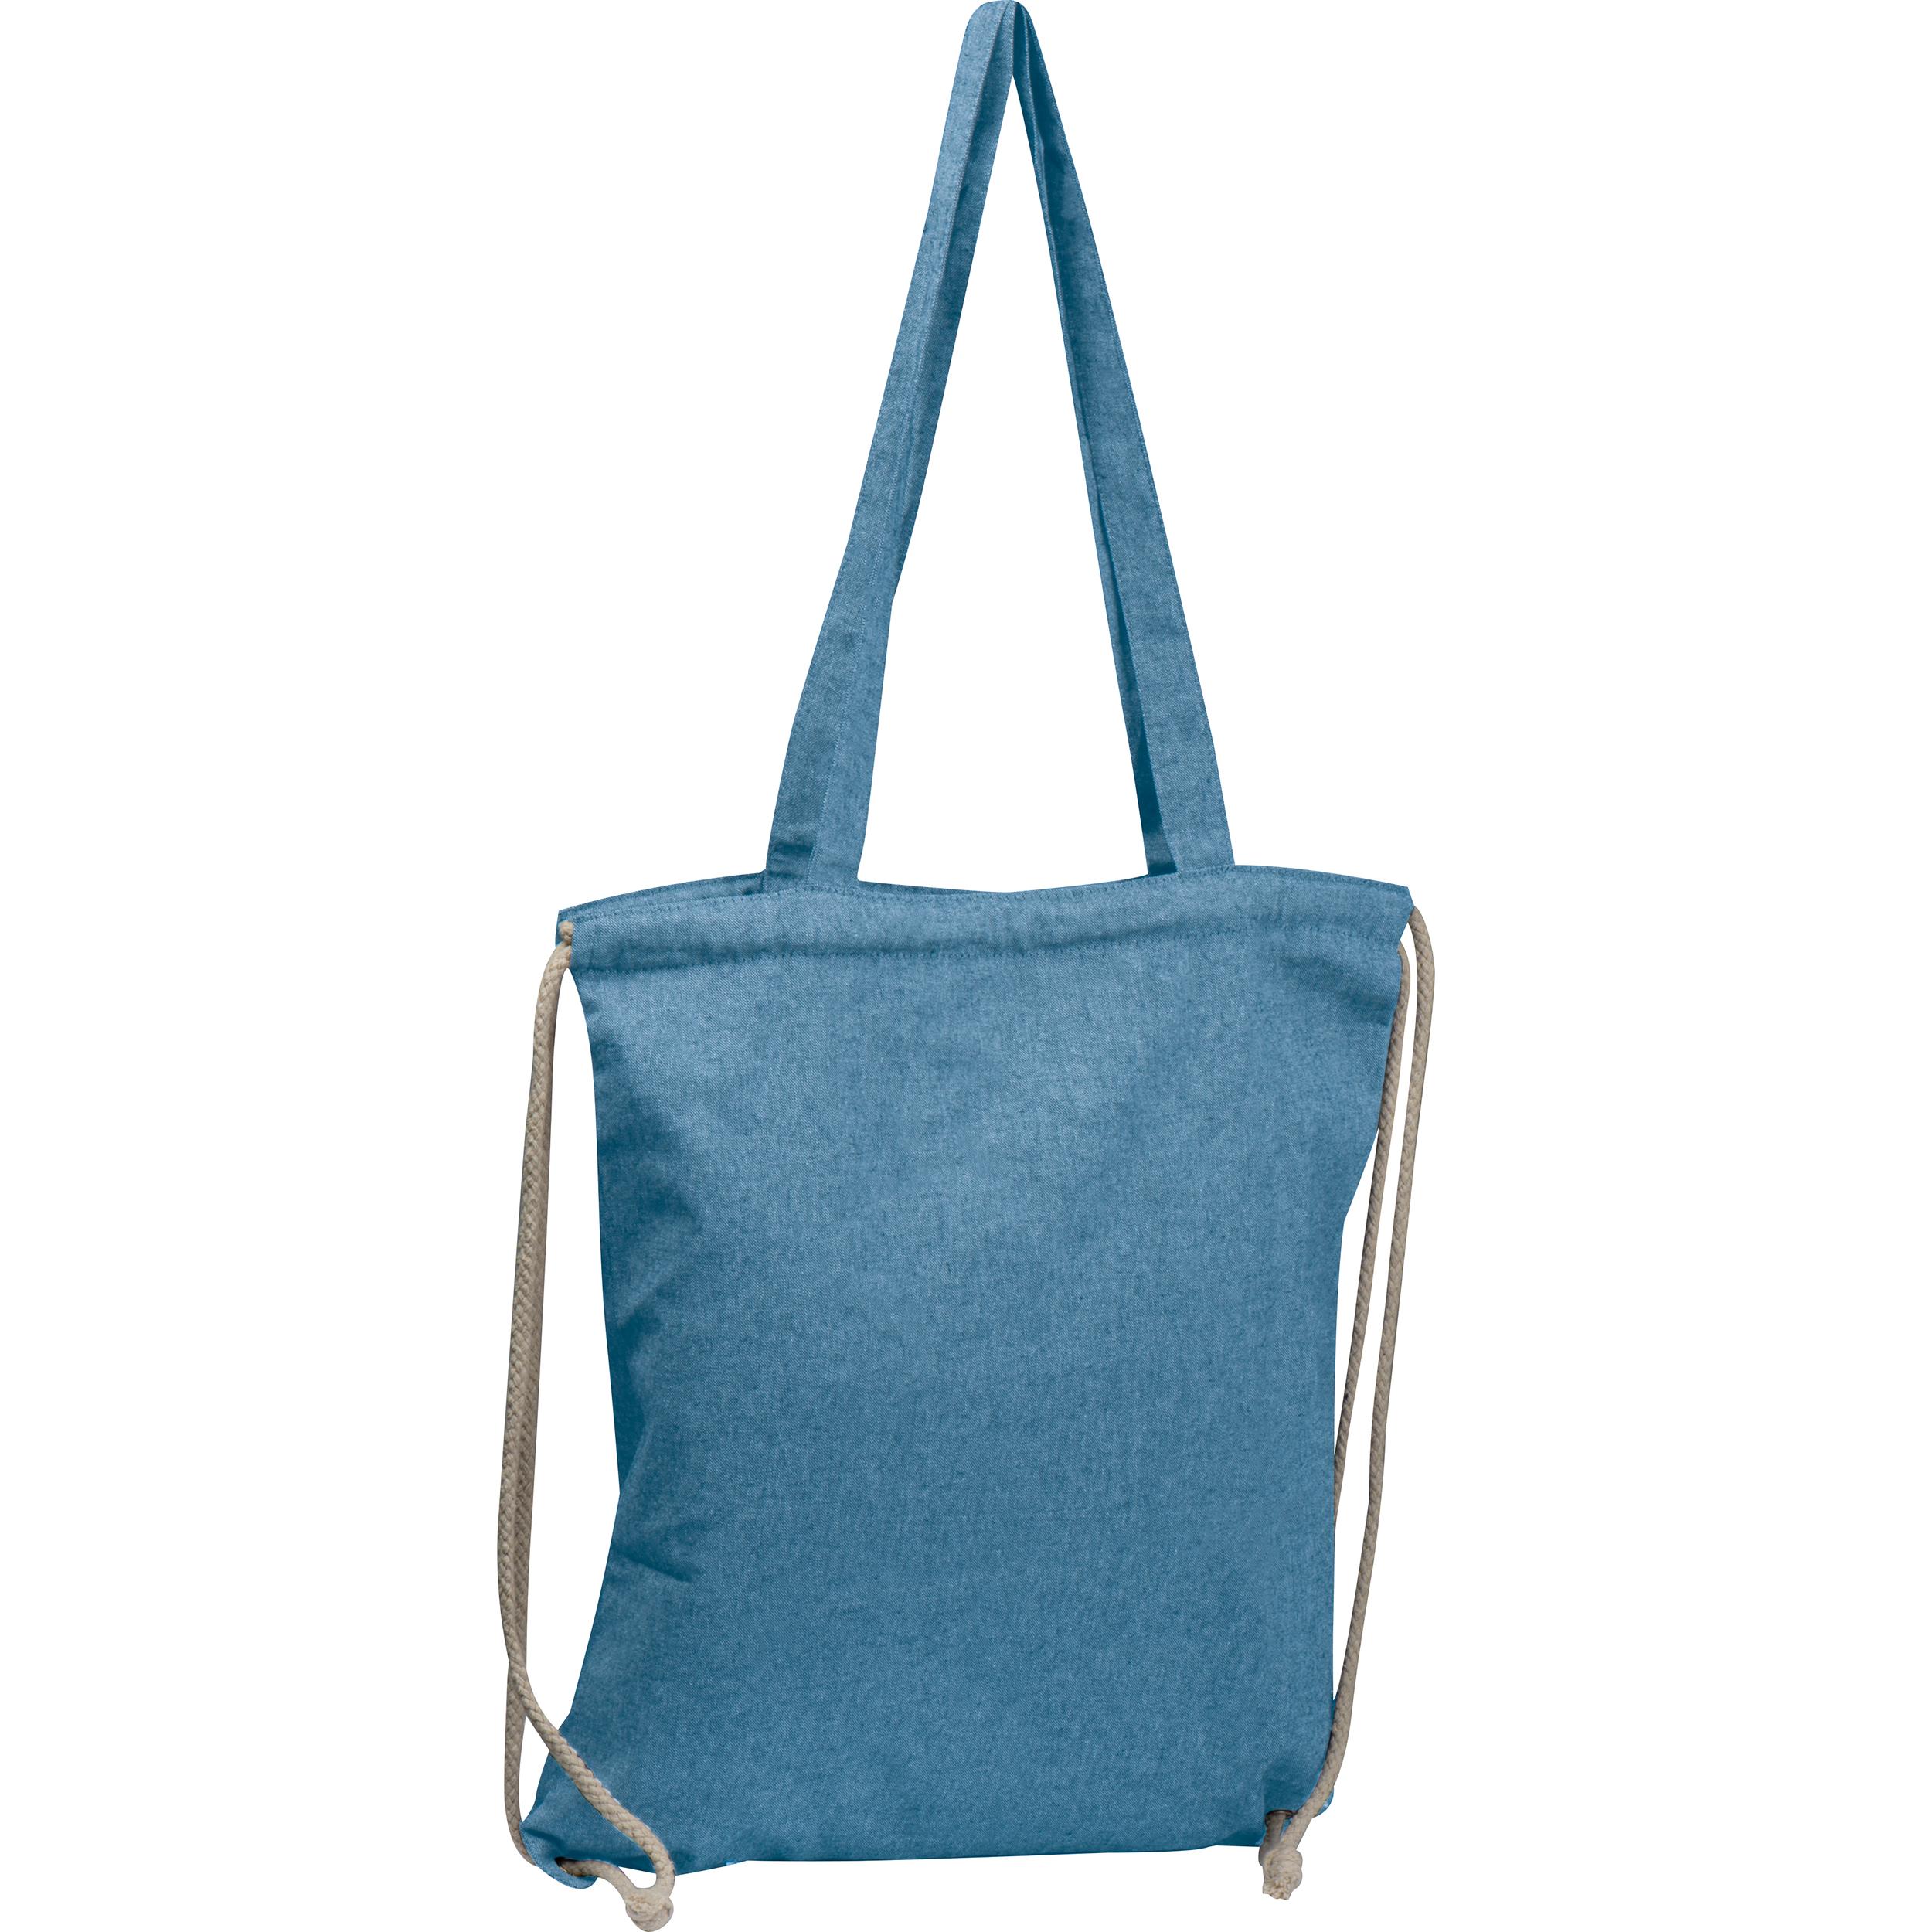 Gym-Cottonbag aus recycelter Baumwolle